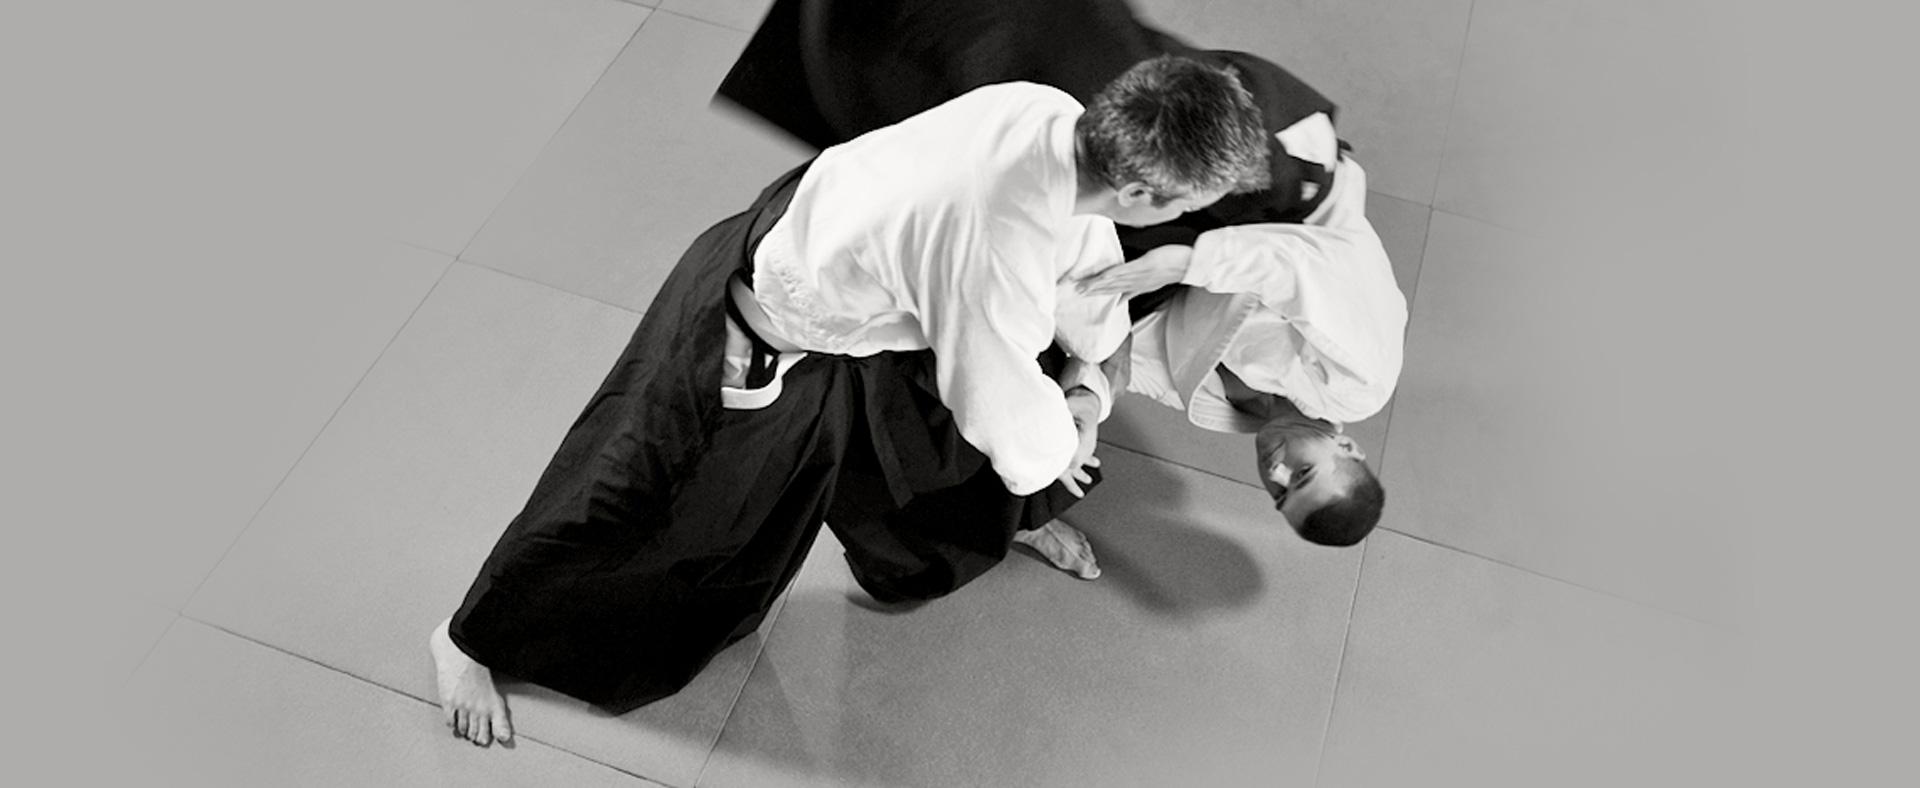 Aikido Berlin - Aikido-Training im Tanden Dojo Berlin